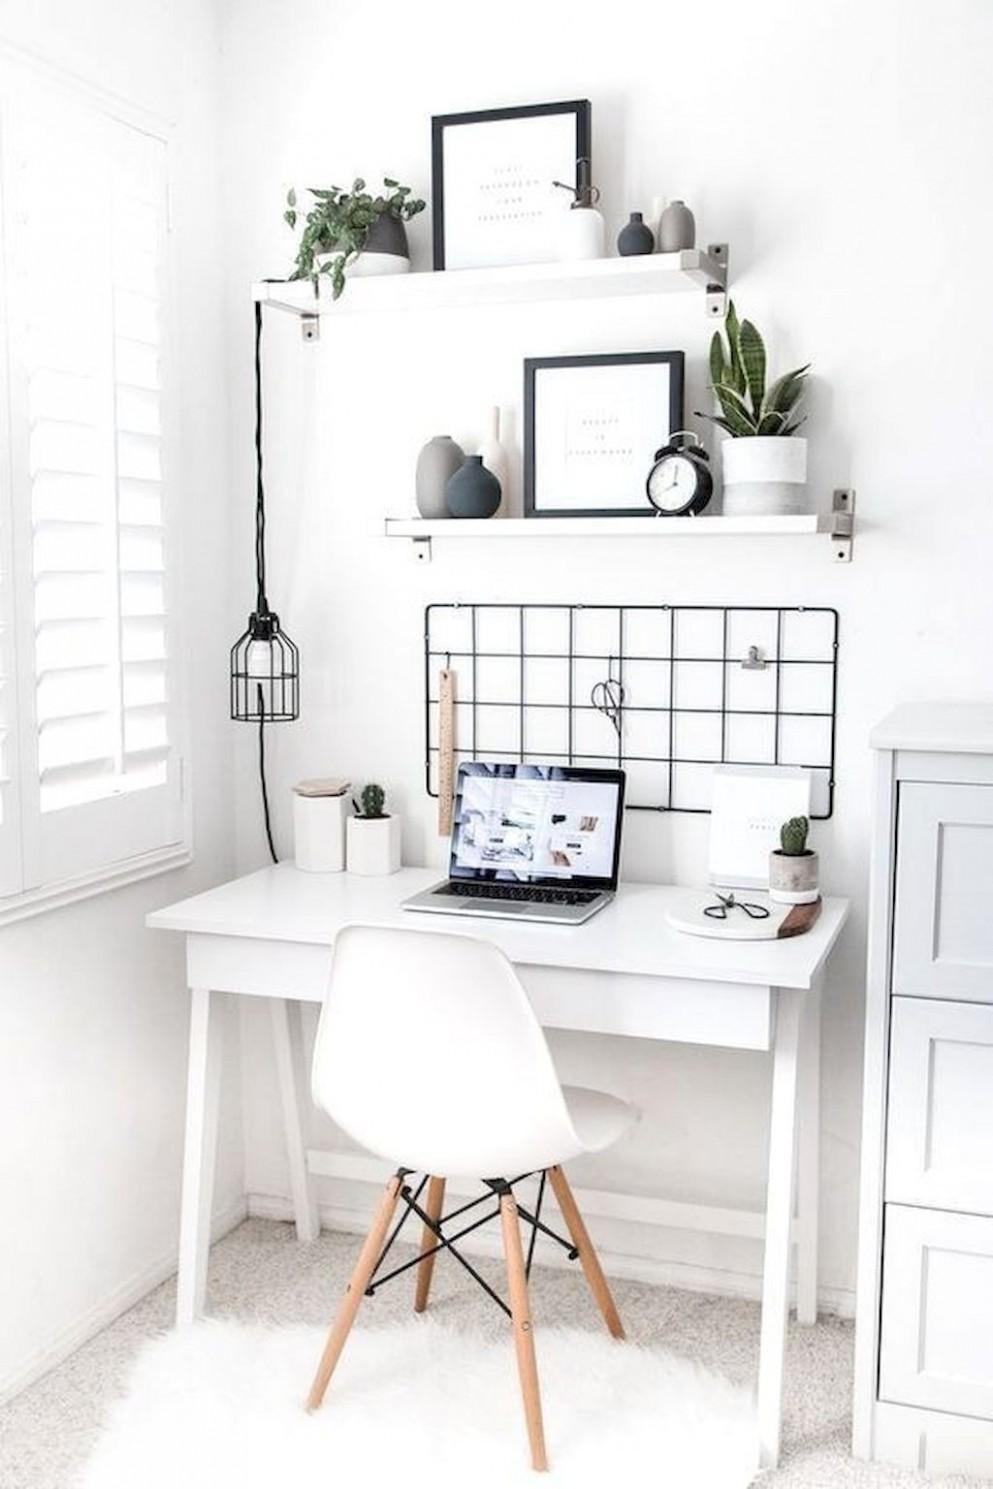 12 Beautiful Minimalist Home Decor Ideas - decorationroom  - Home Office Accessories Ideas